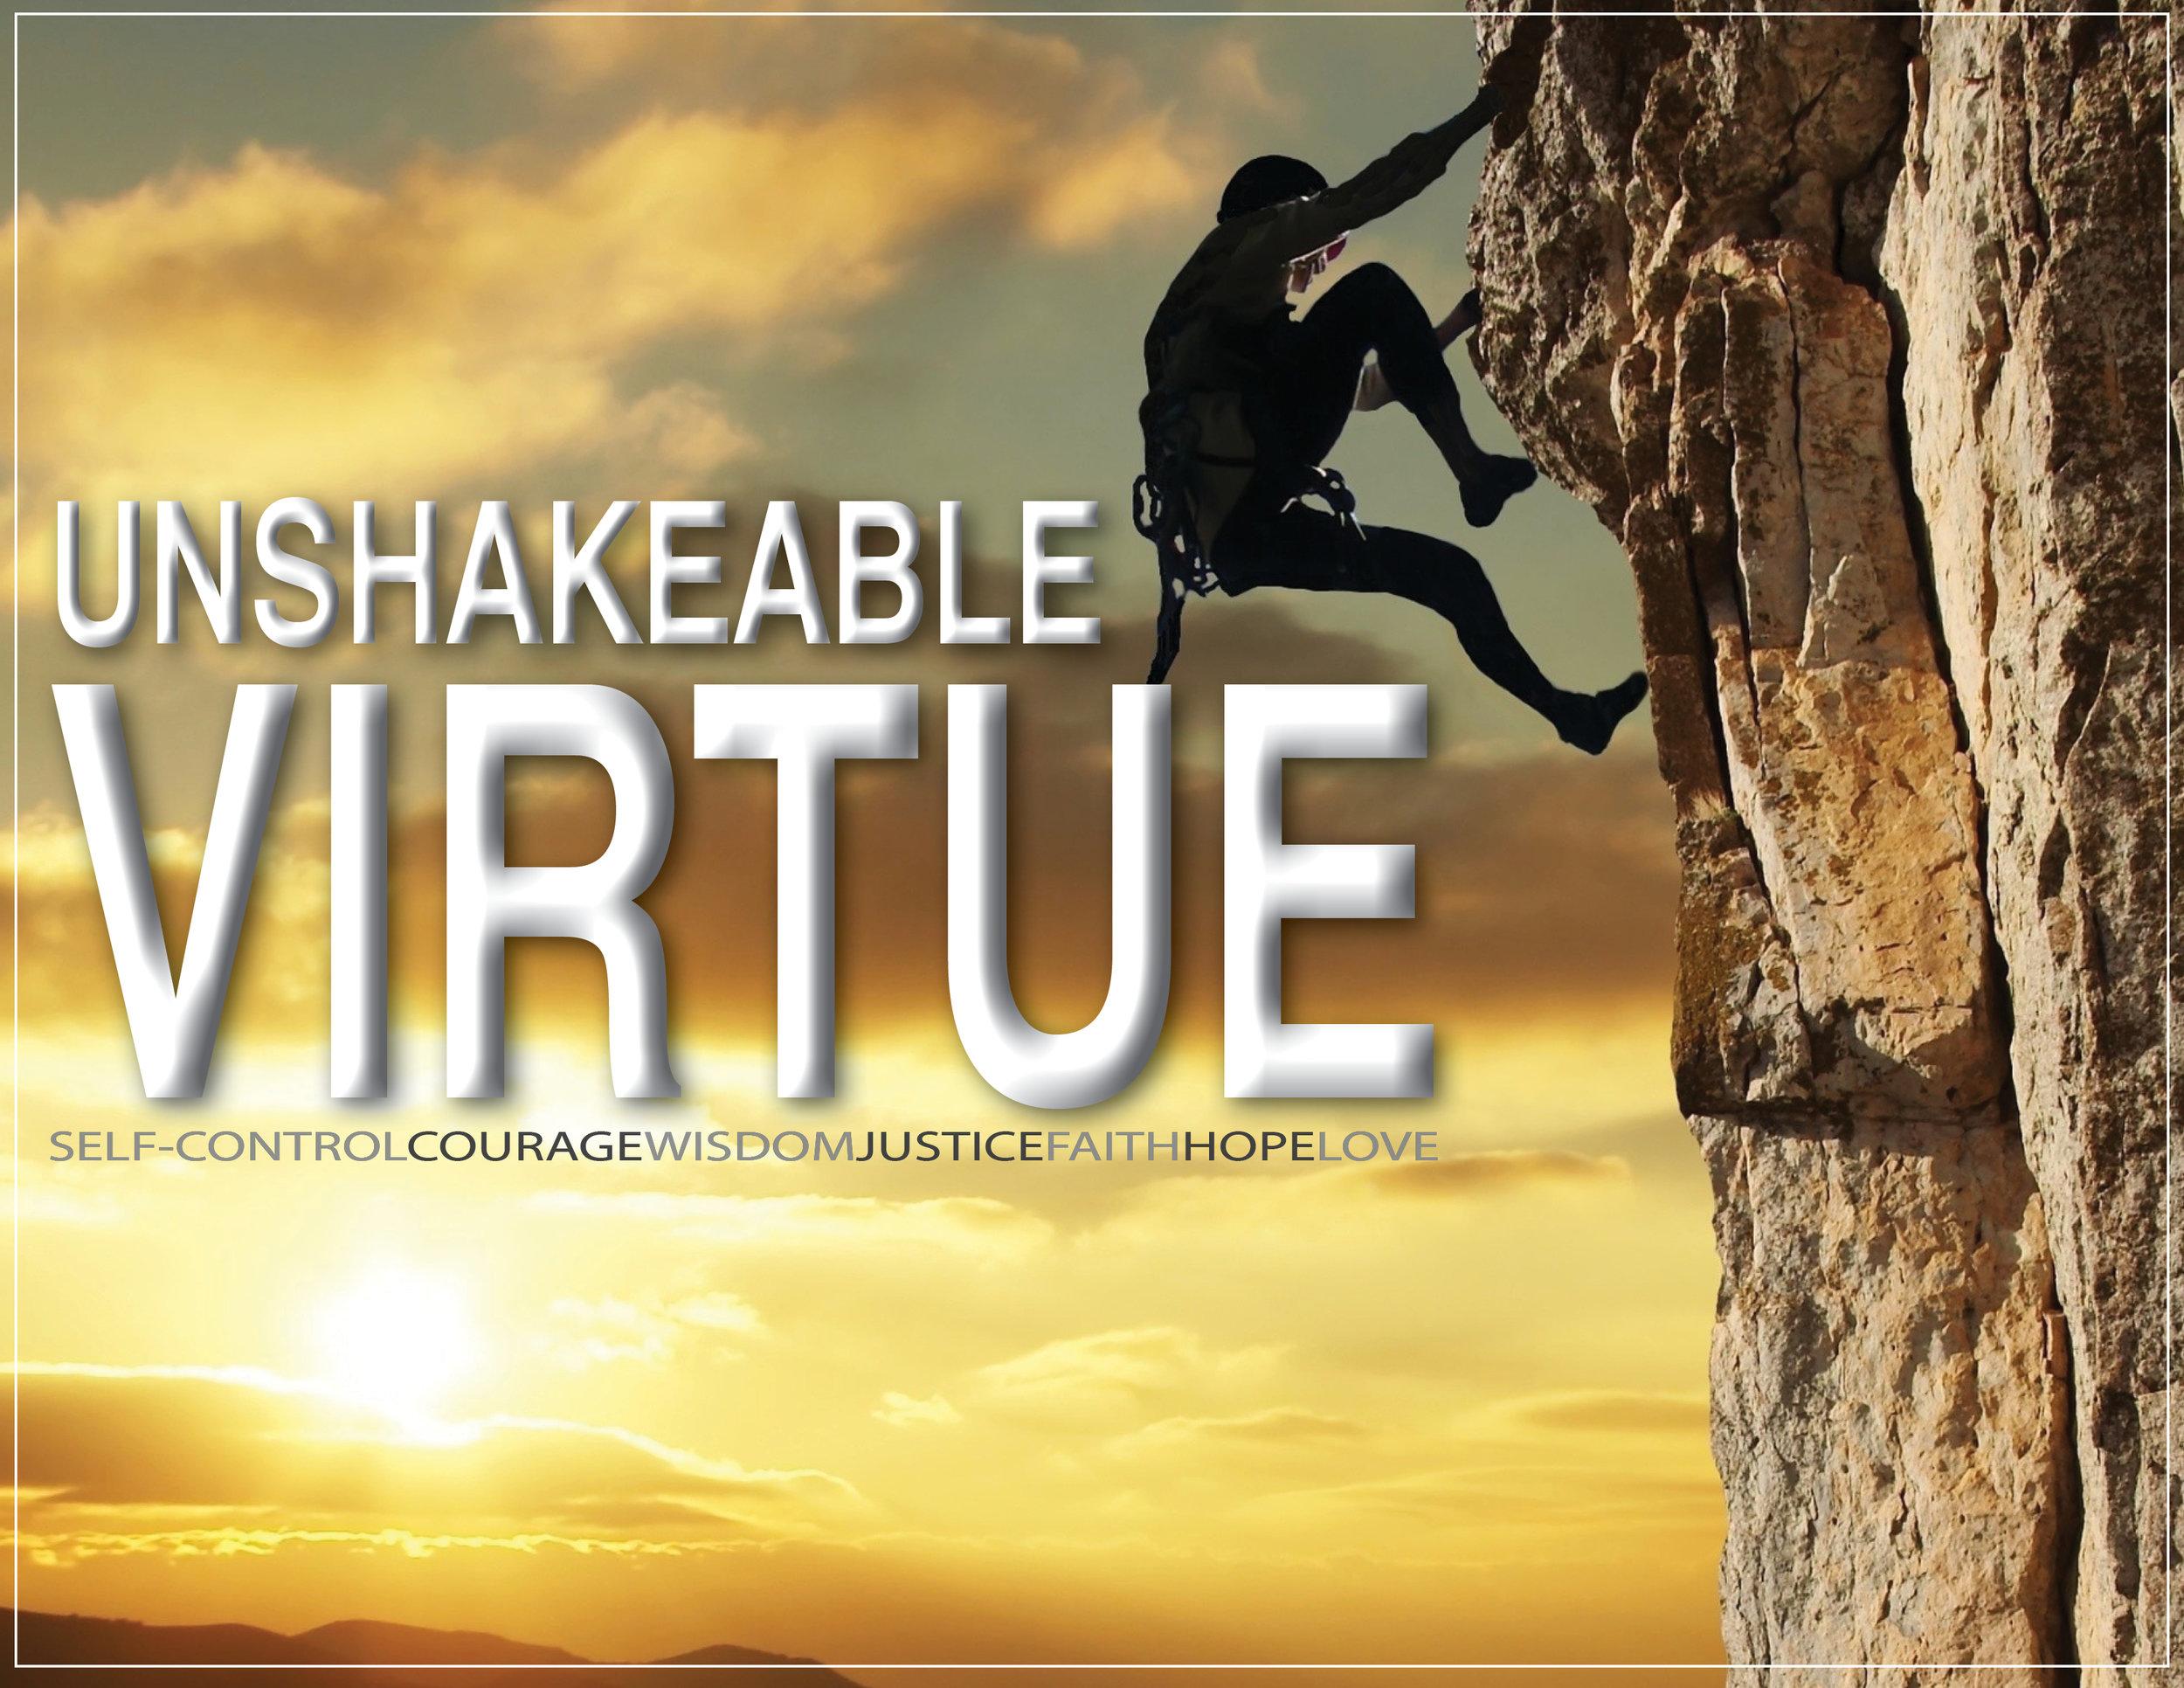 Unshakeable Virtue Image.jpg